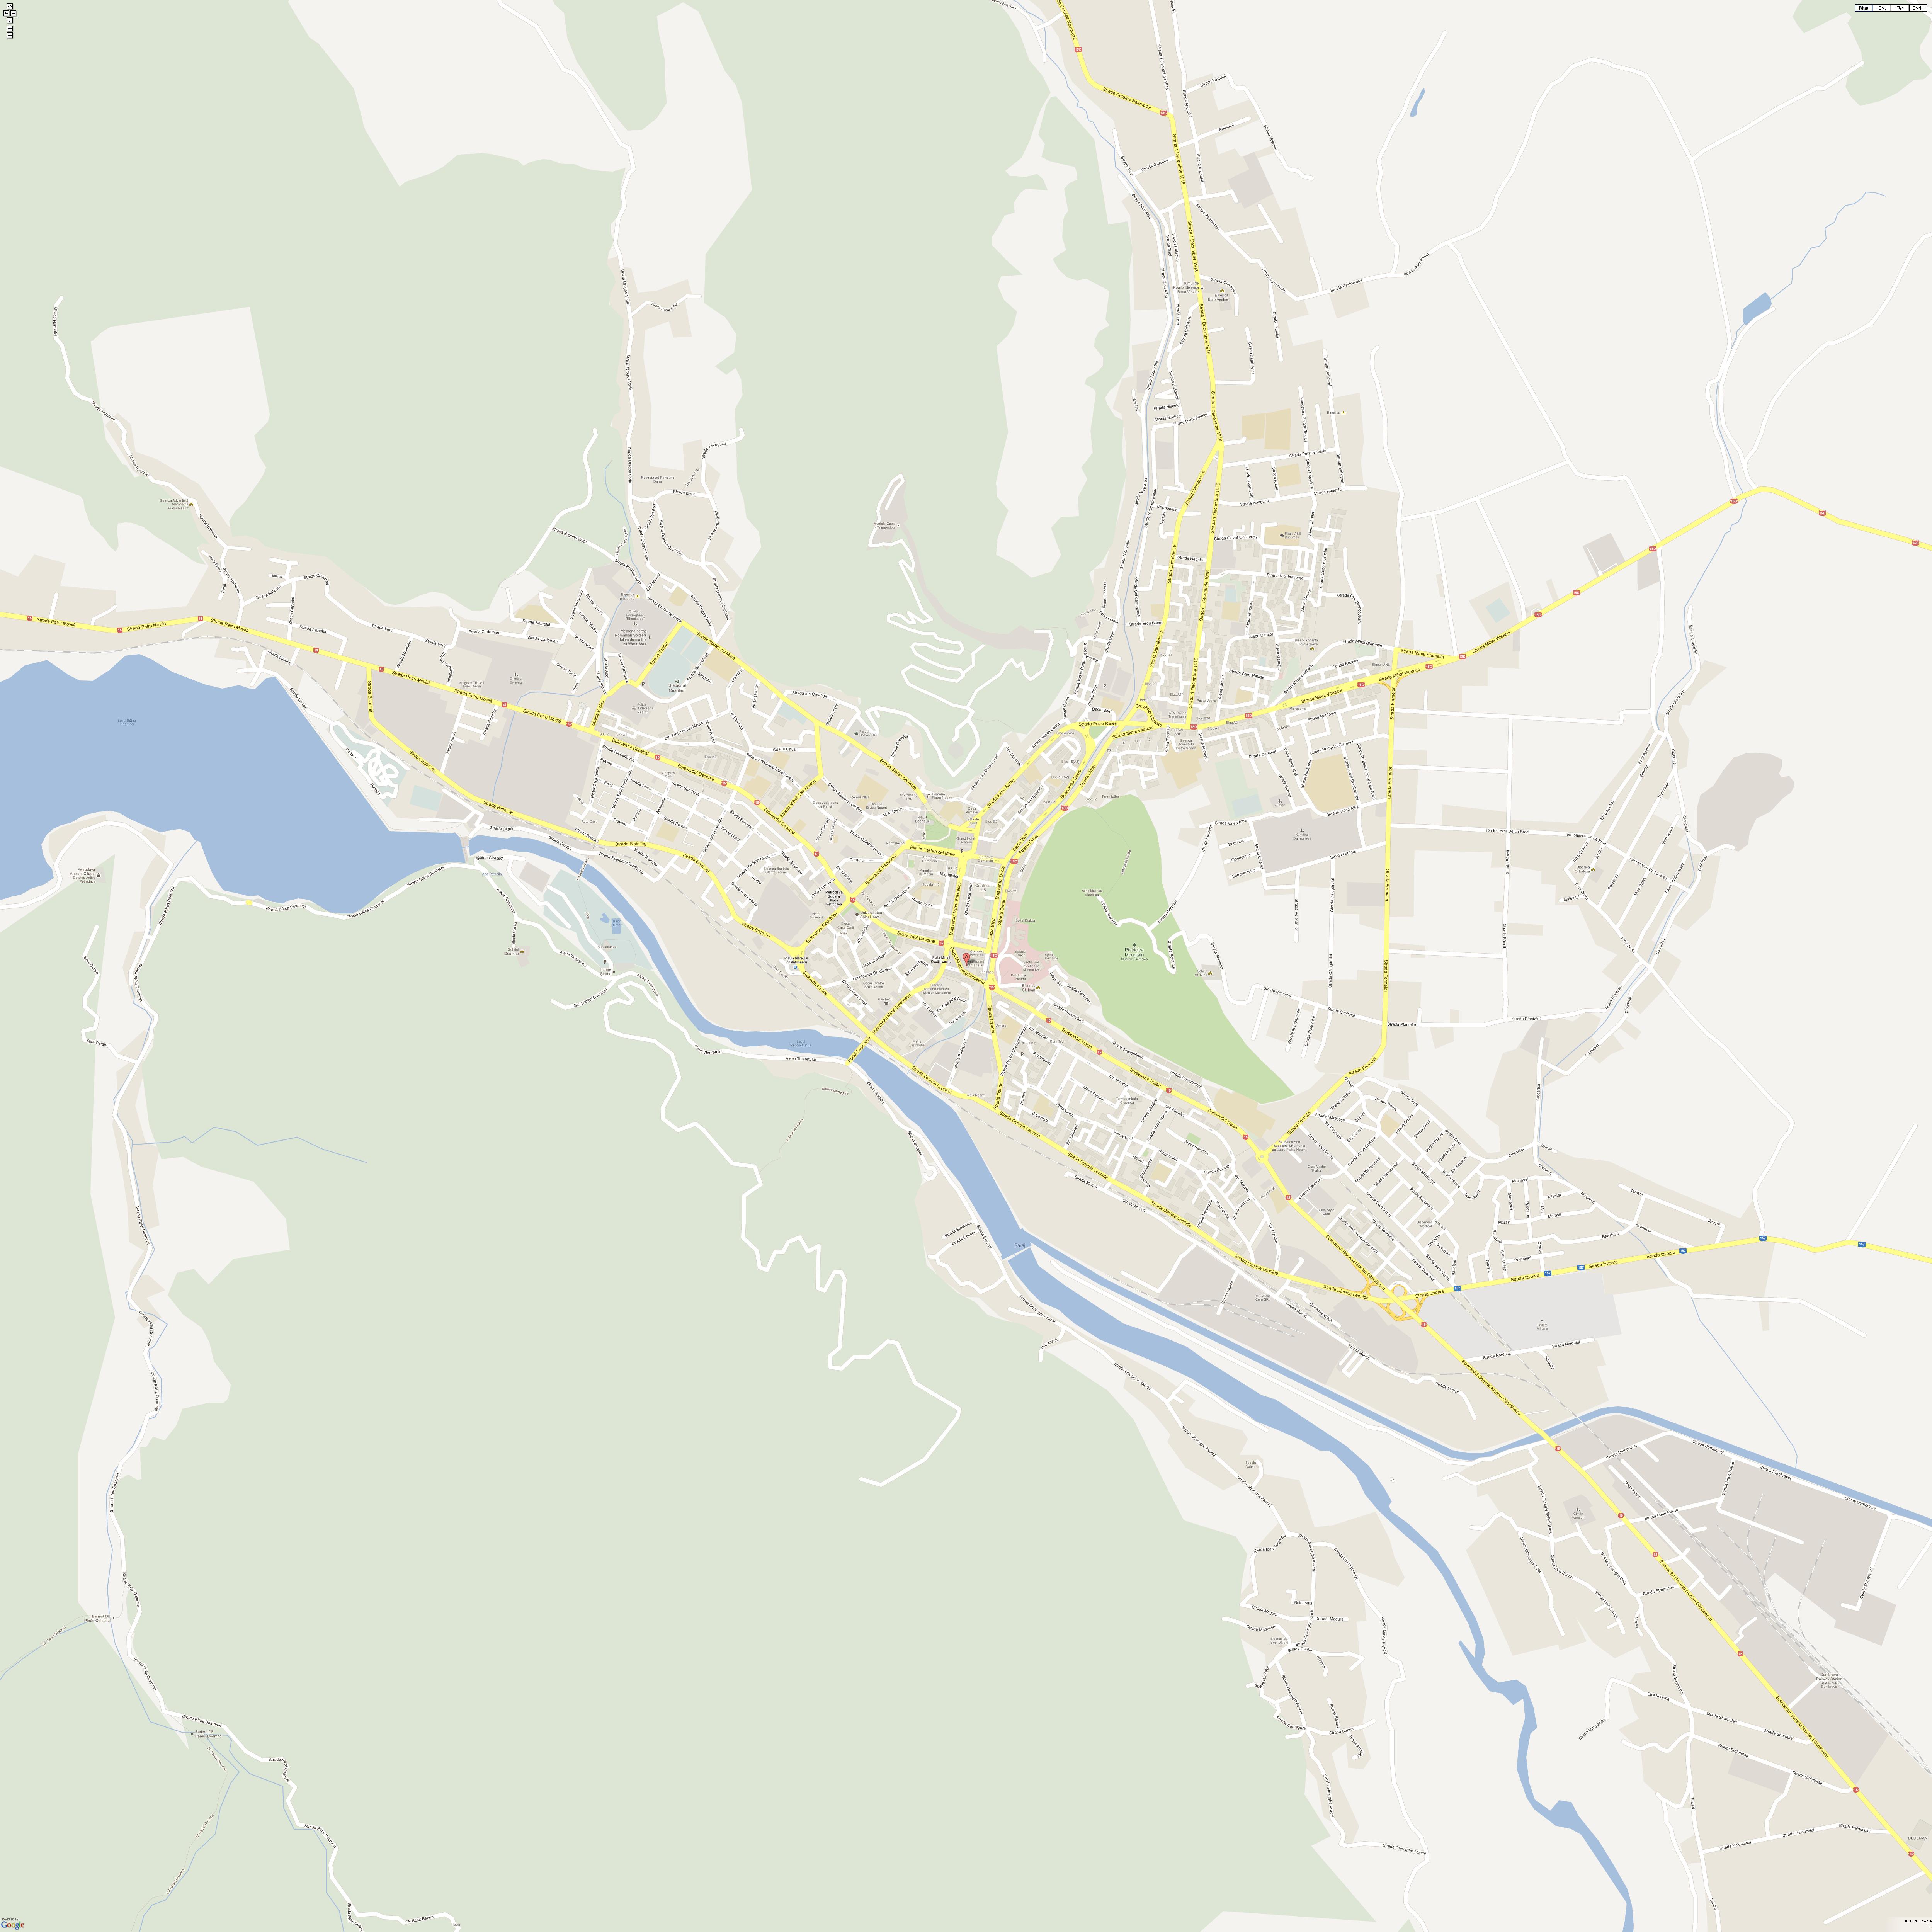 Harta Piatra Neamt Profu De Geogra